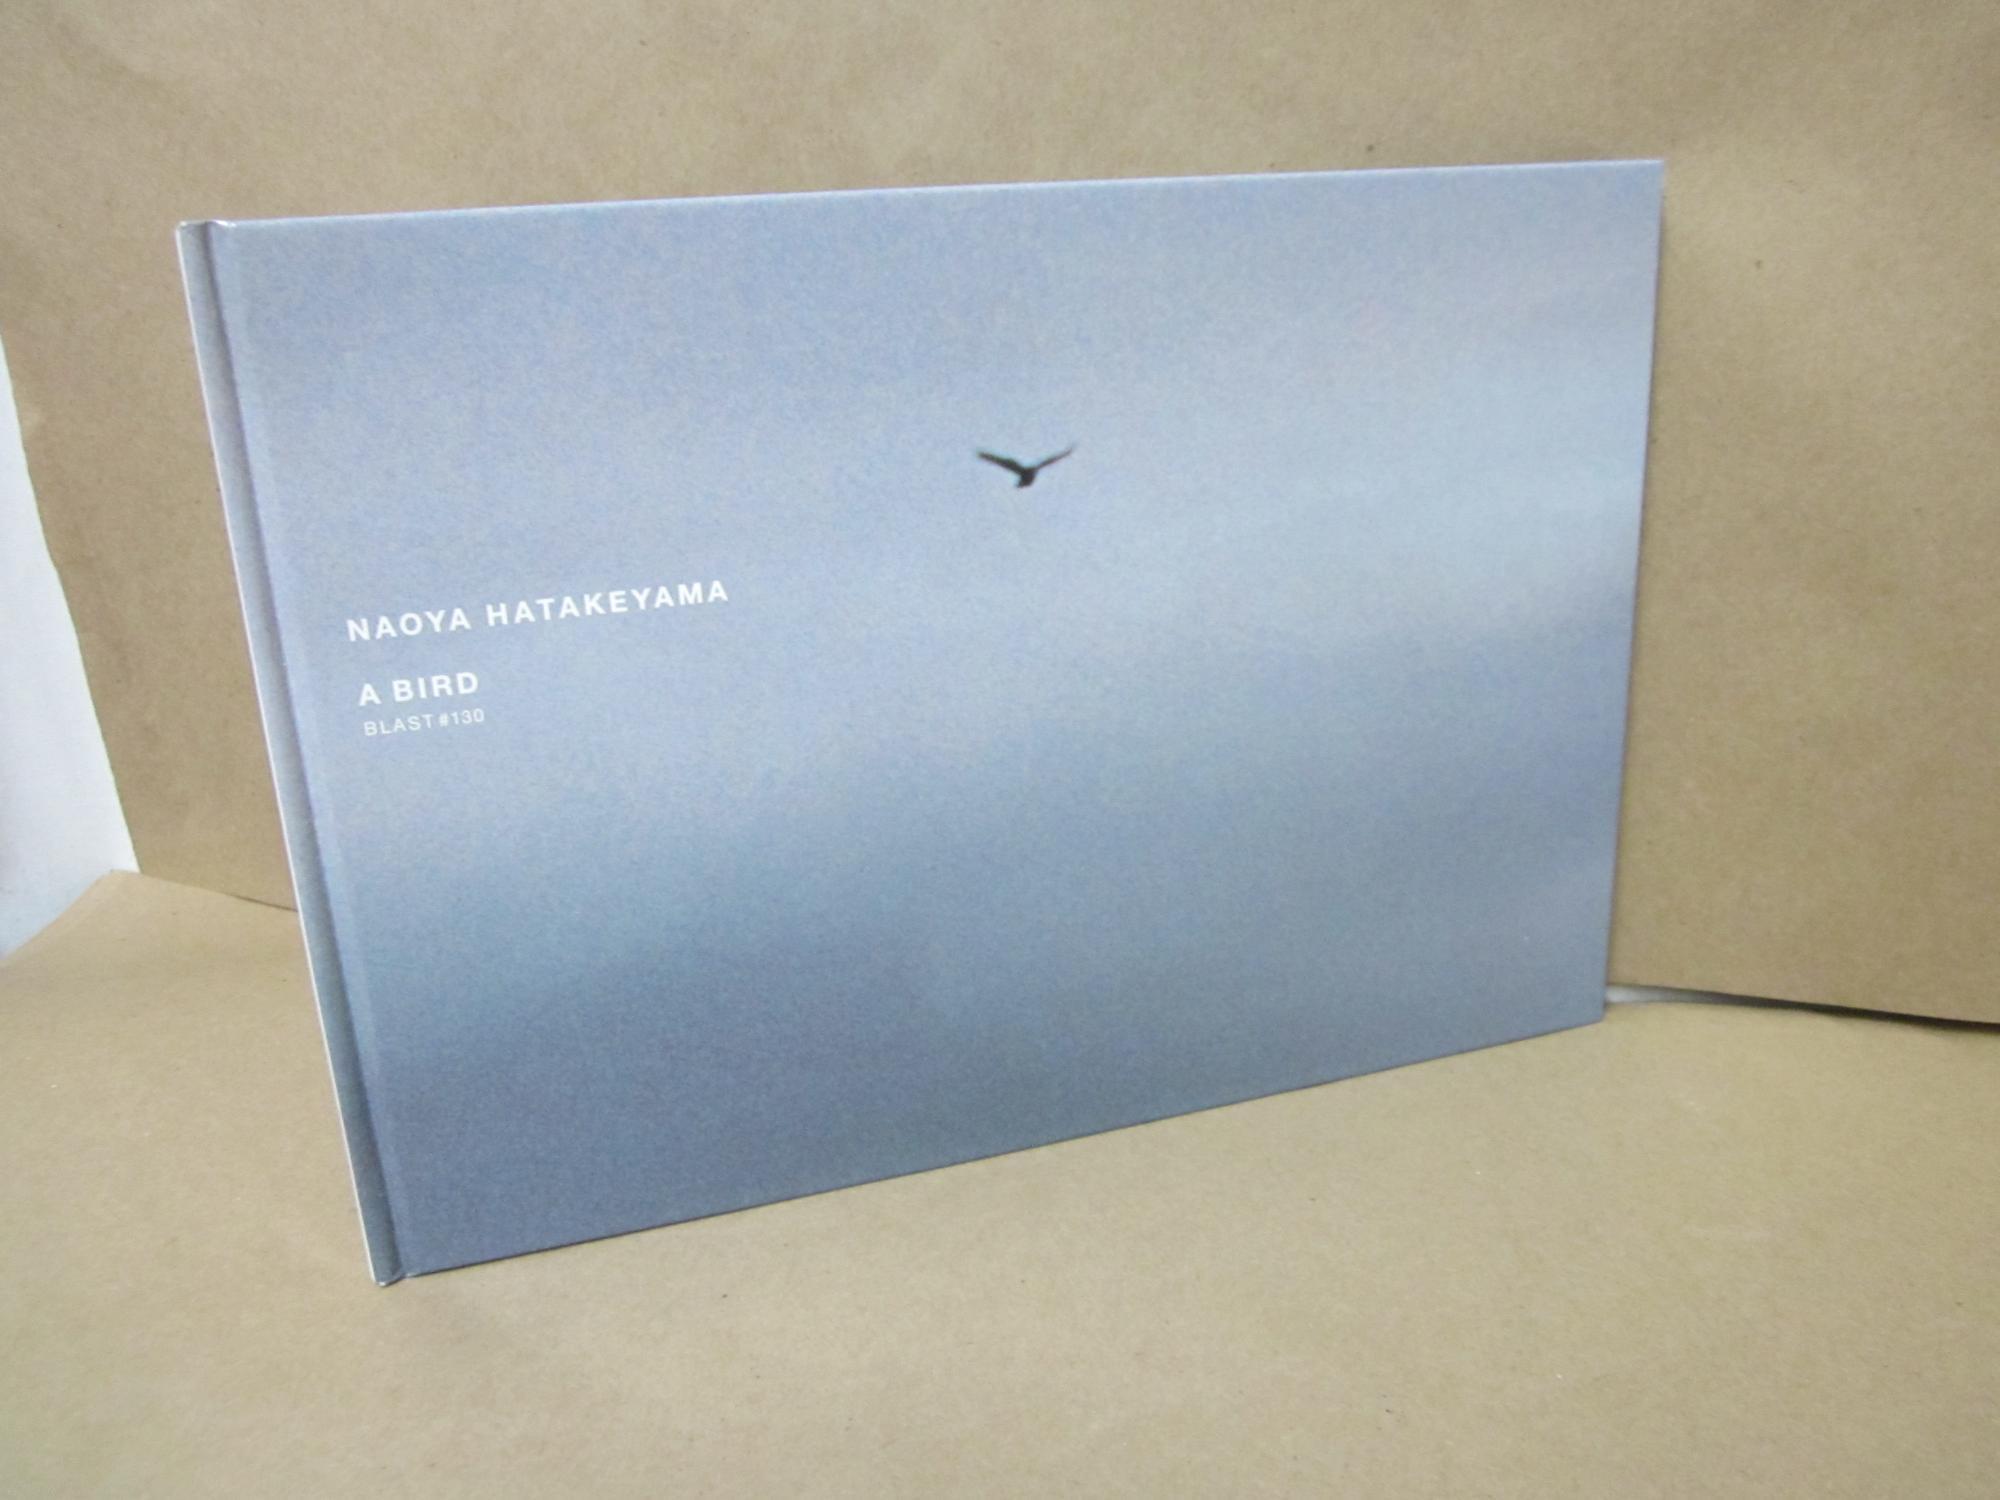 A_Bird_Blast_130_Signed_&_inscribed_Hatakeyama_Naoya_photo_Assez_bon_Couverture_rigide